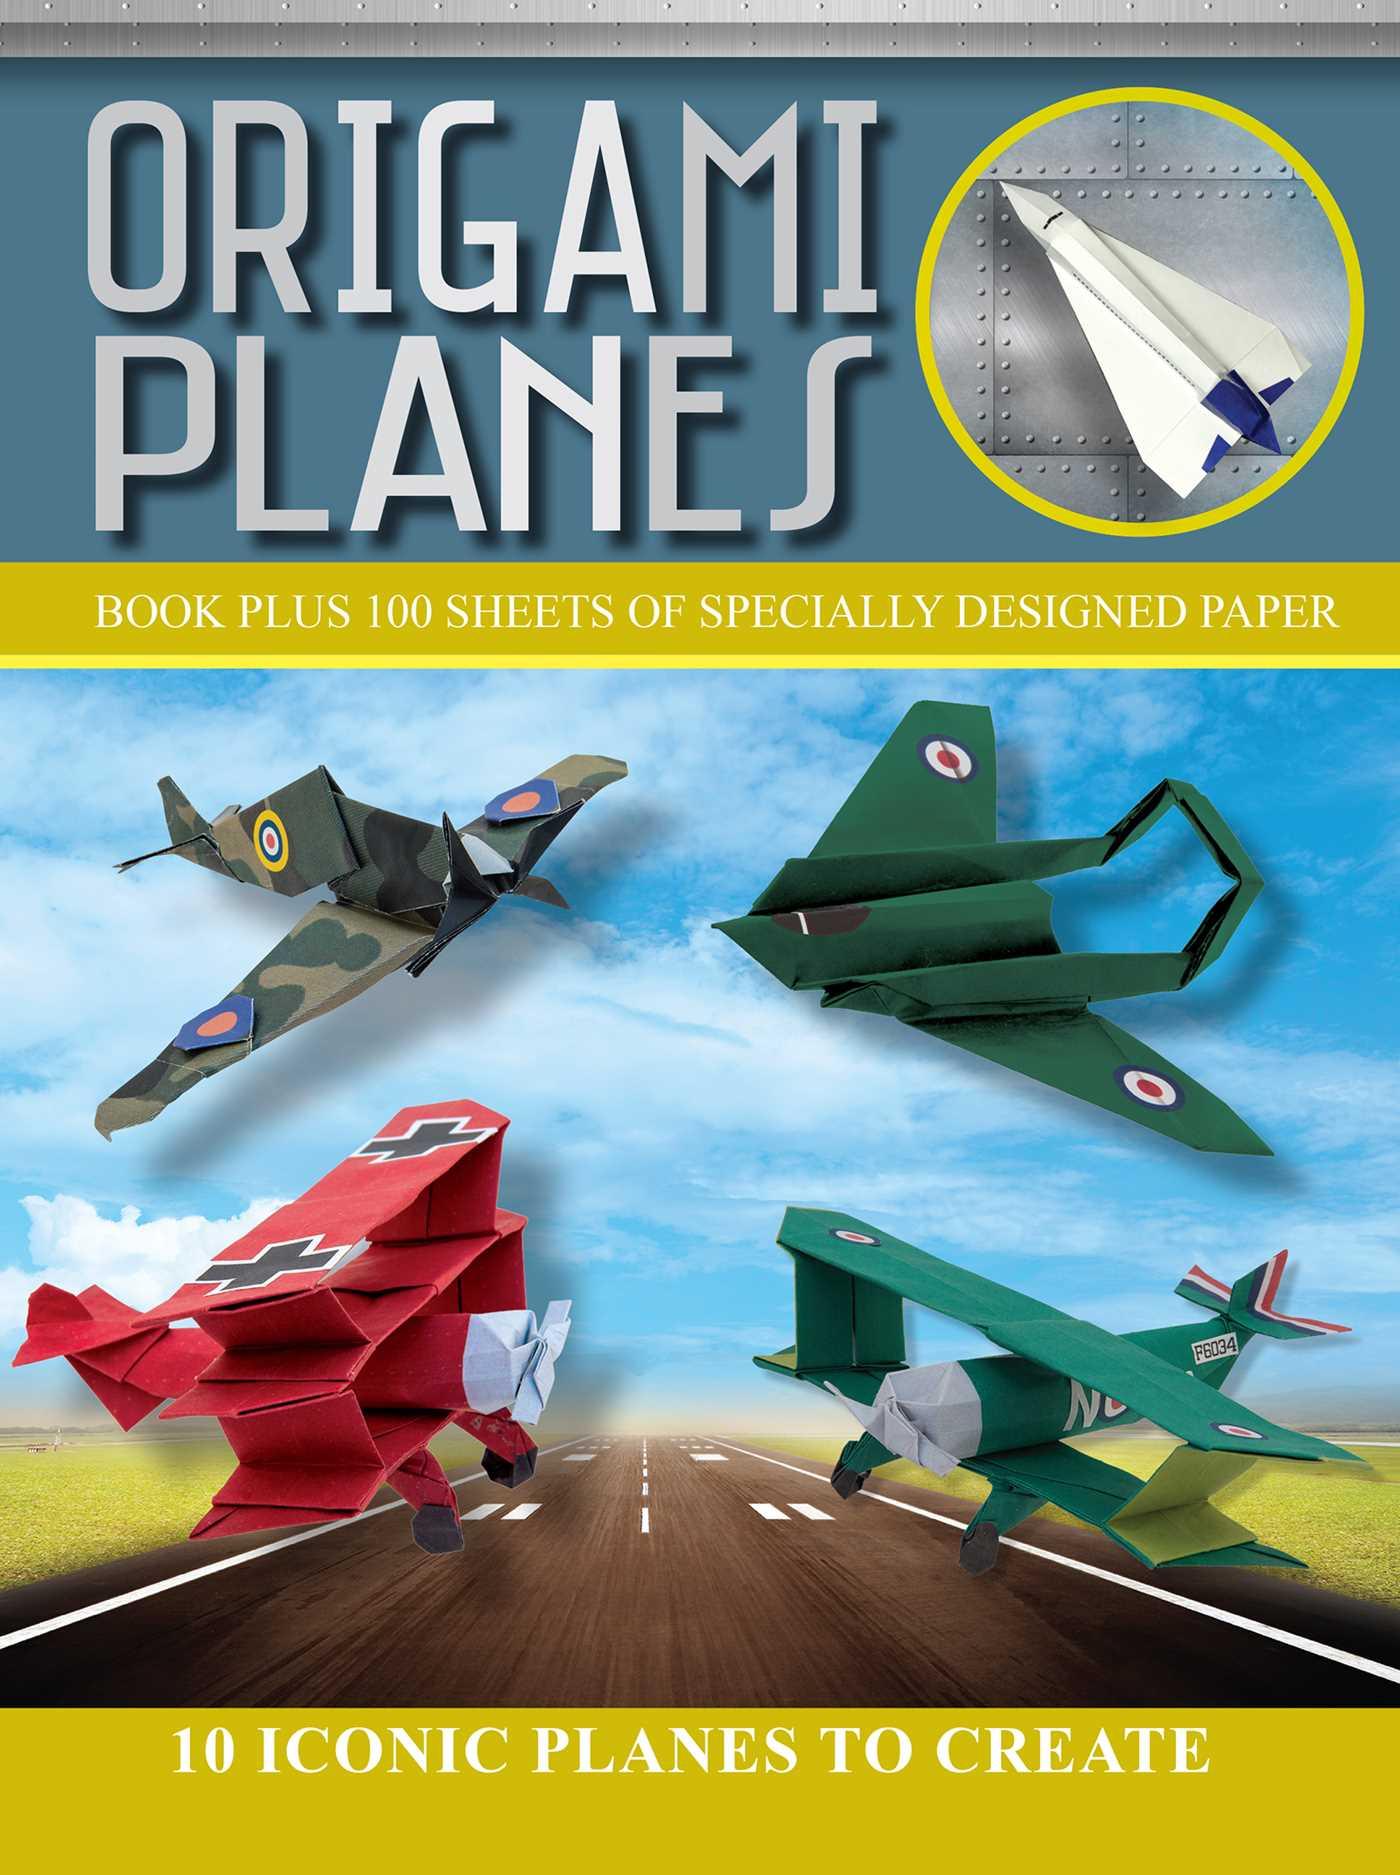 Origami Planes Ebook By Seth Friedman Marc Kirschenbaum Jason Ku Paper Airplane Diagrams 9781626868175 Hr